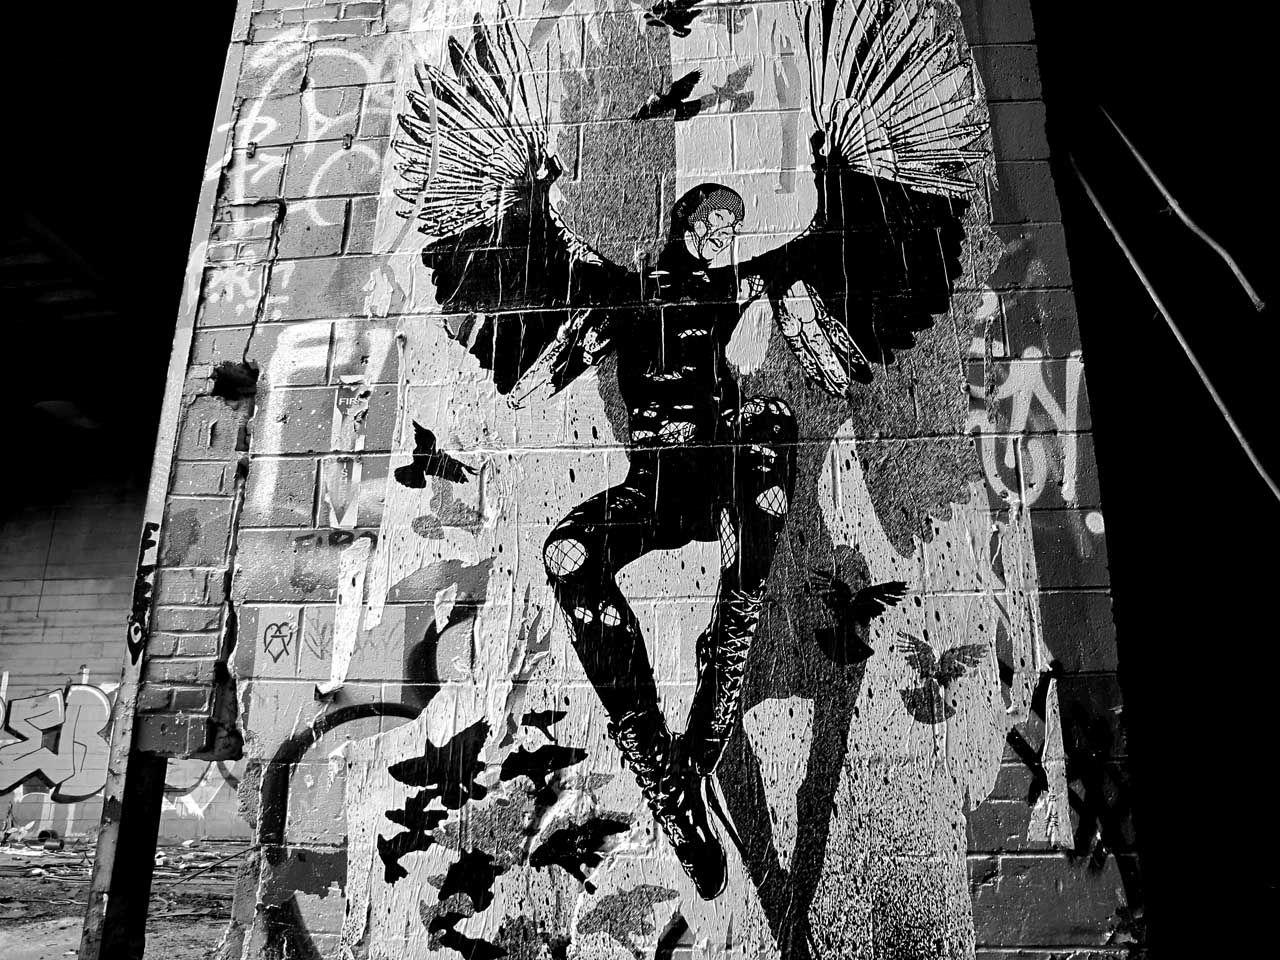 Wk interact widewallsartistwkinteract street art